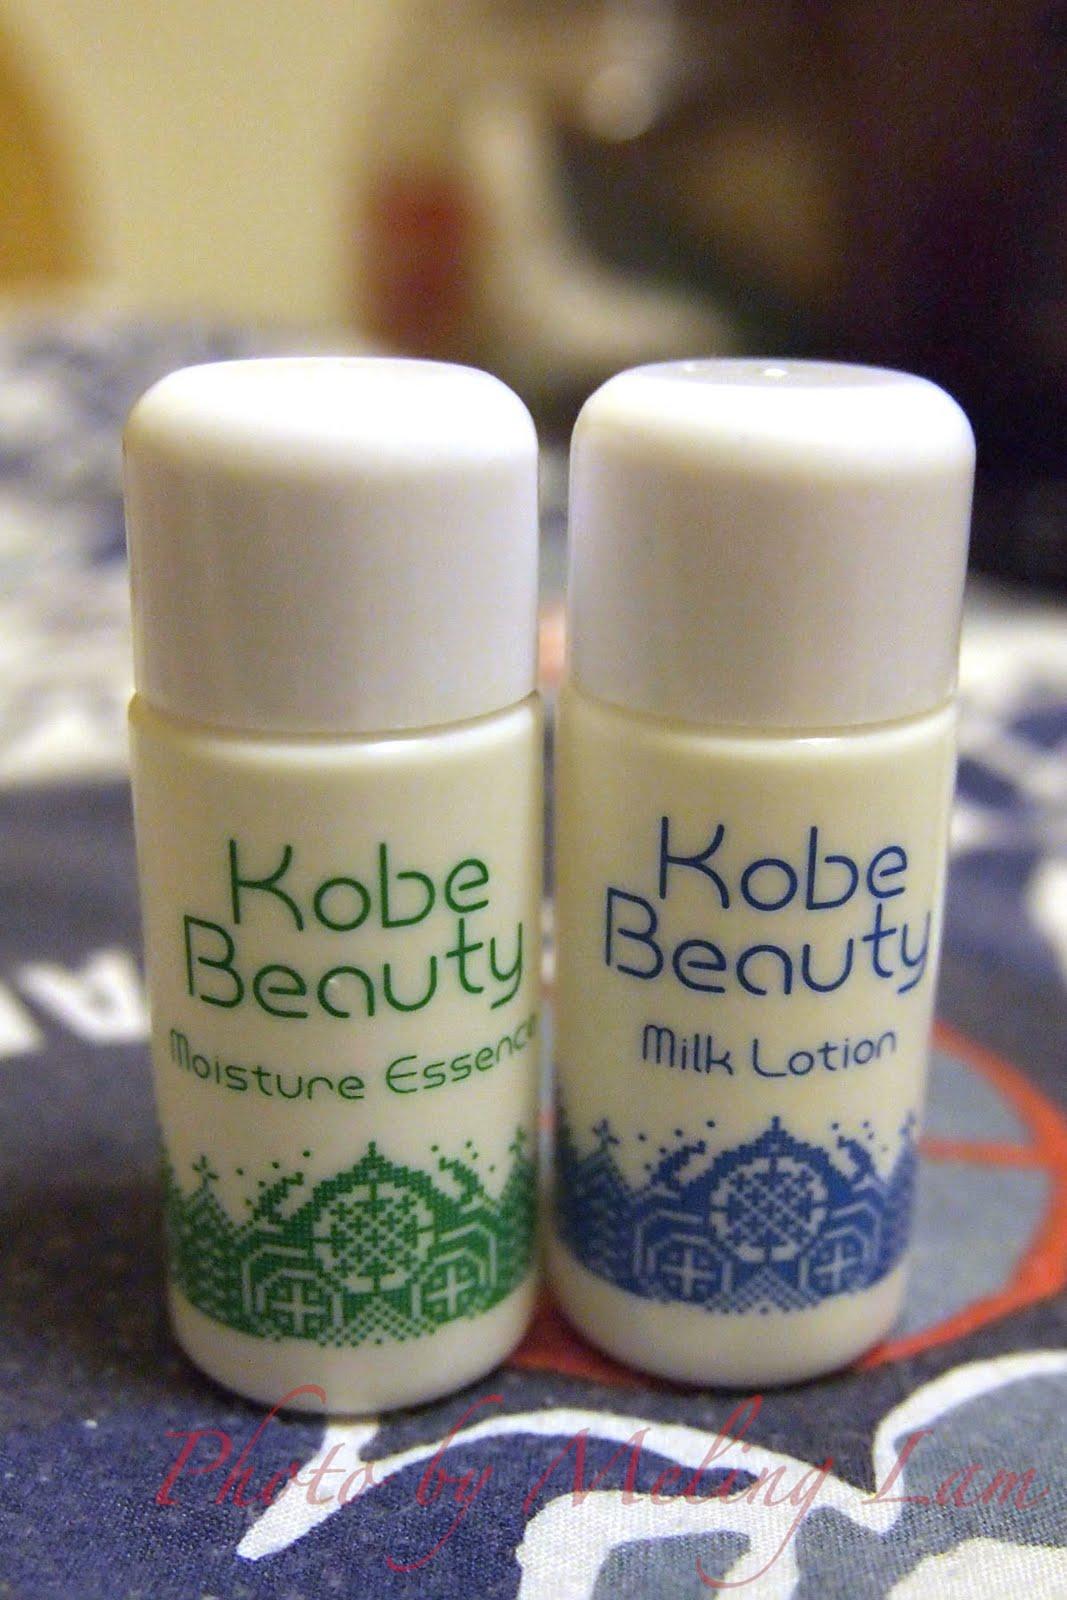 kobe beauty trial kit milk lotion moisture essence